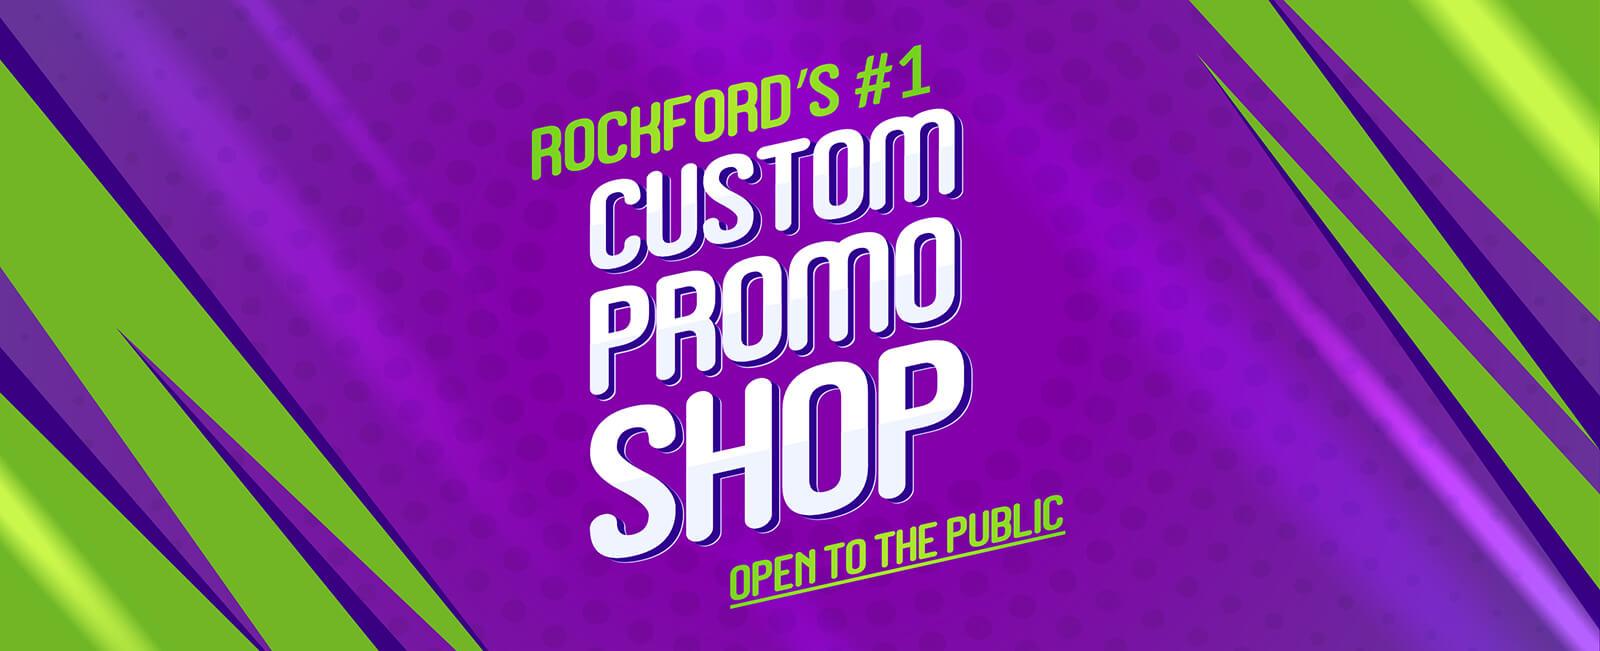 Rockfords #1 Custom Promo Shop